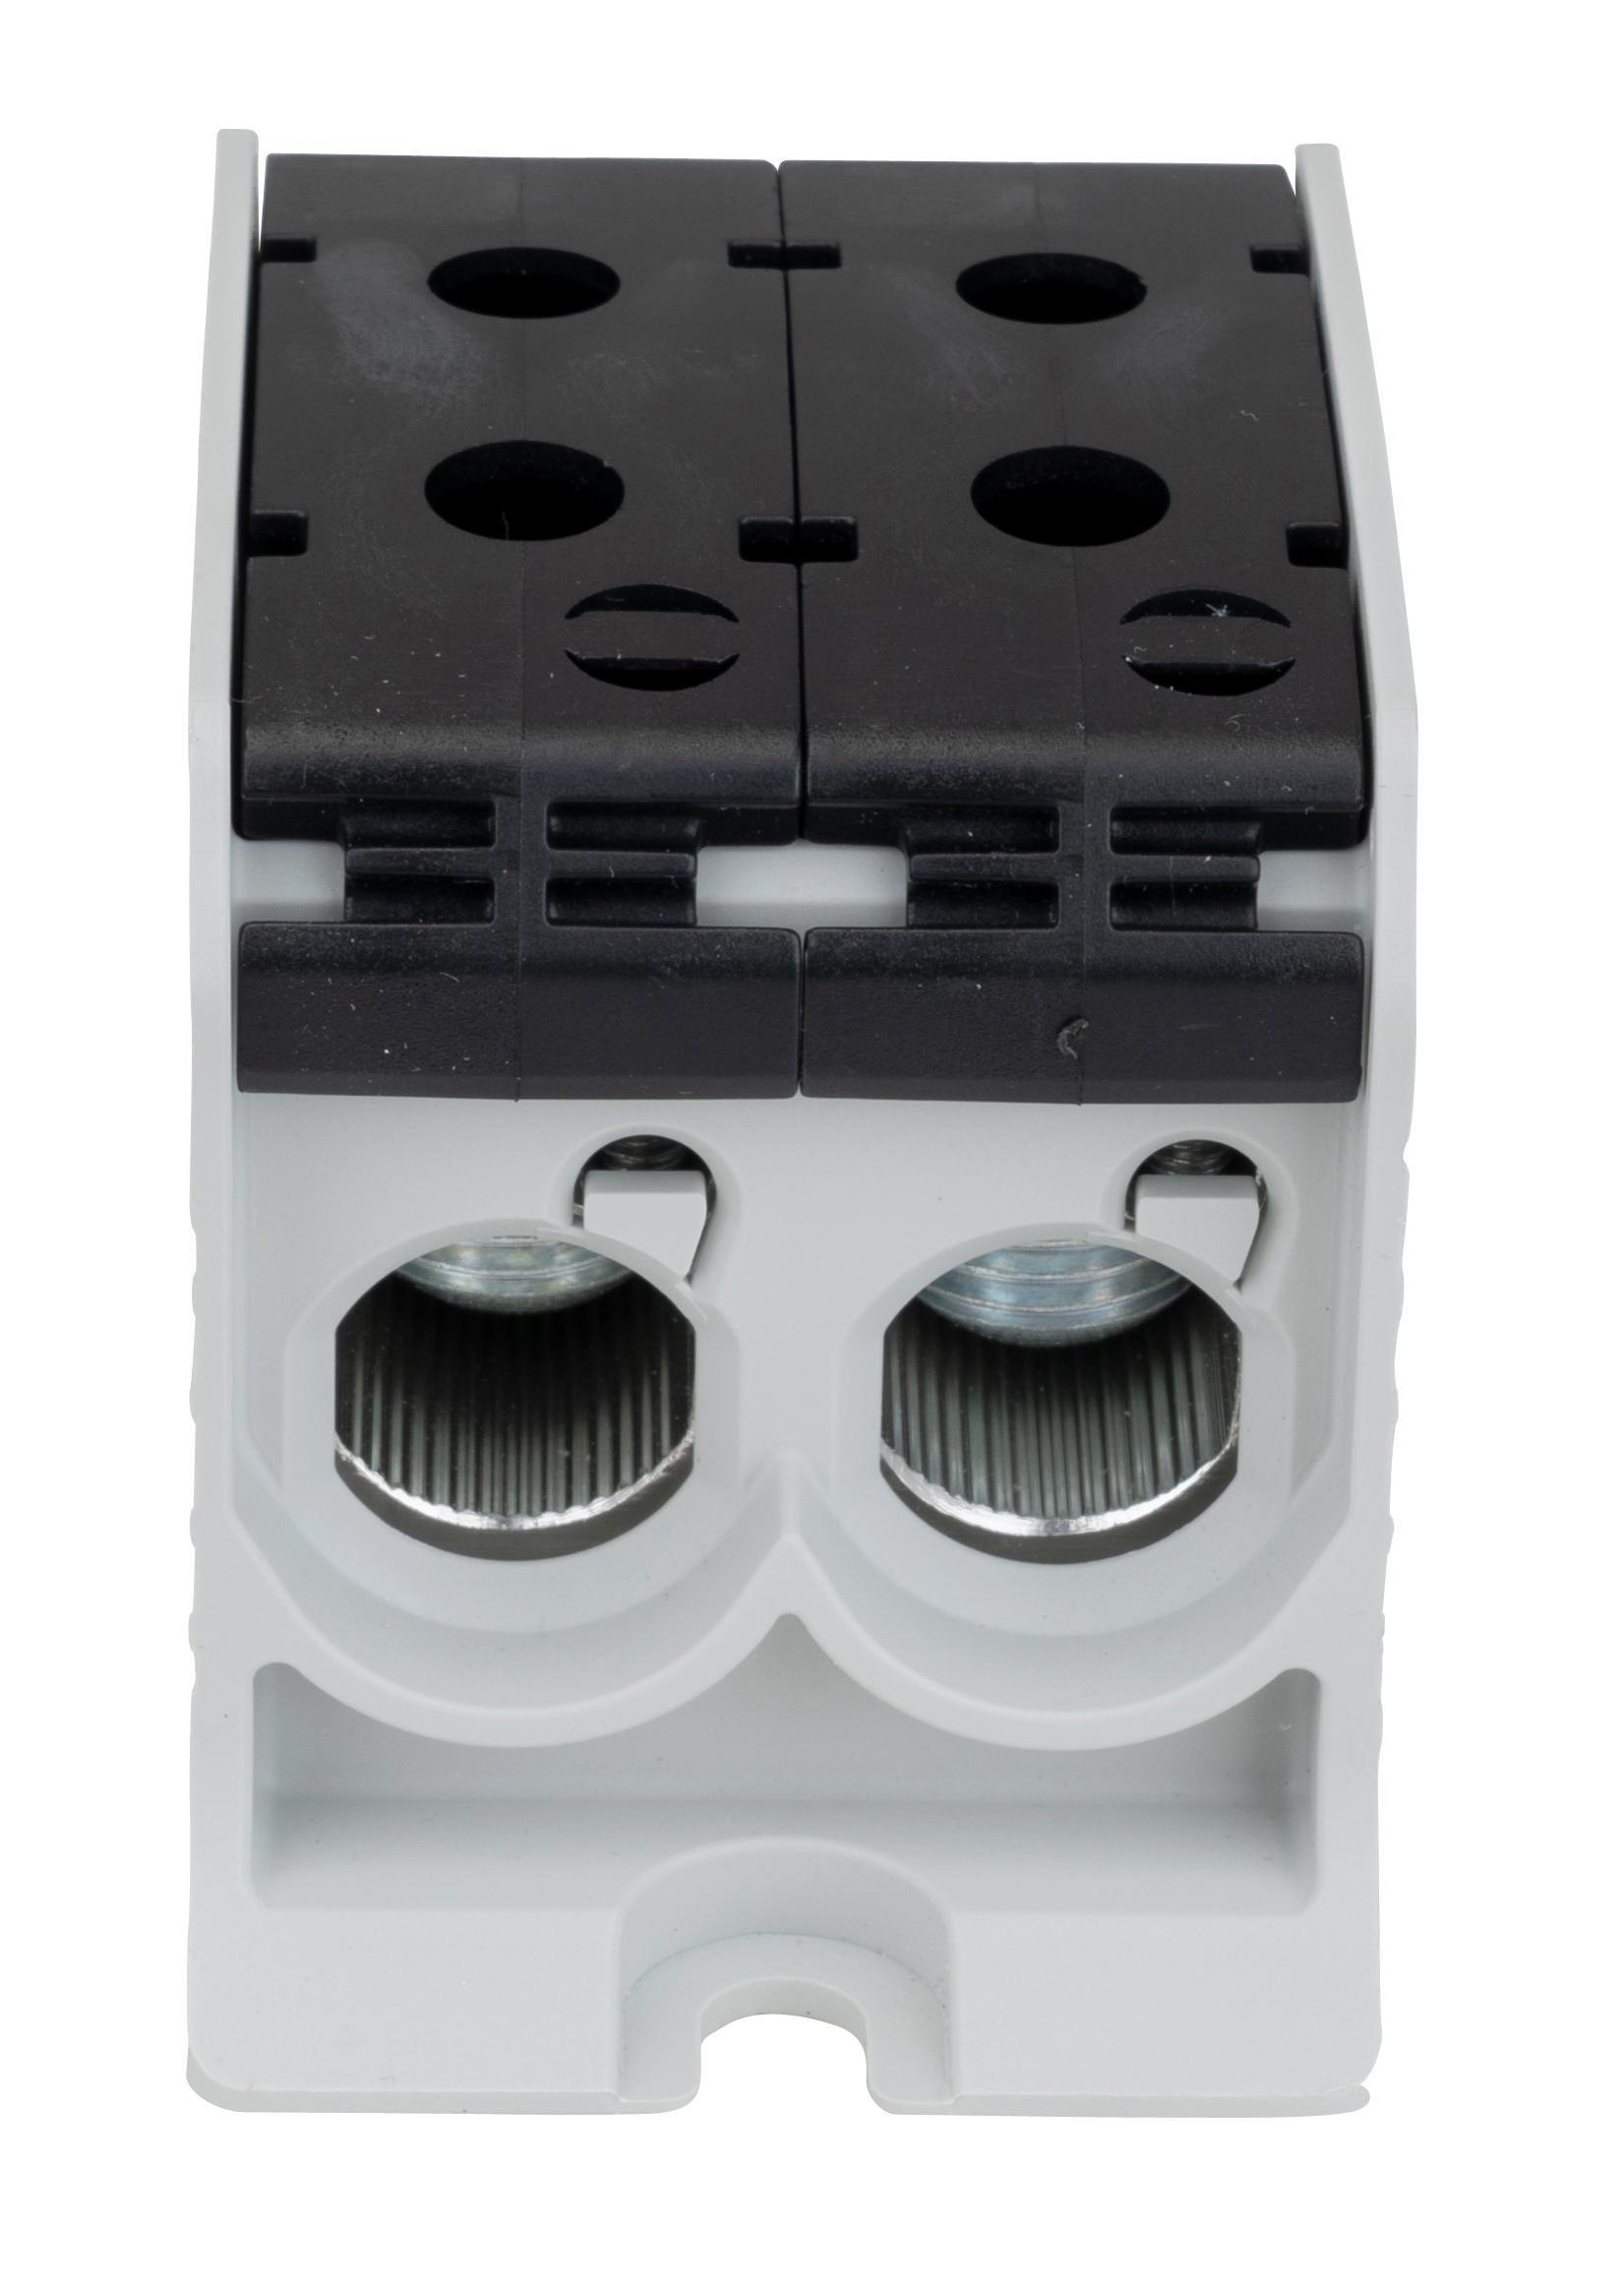 1 Stk Aluminium /Kupfer Klemme, 1-polig, Doppel 95mm² schwarz IKA21456--